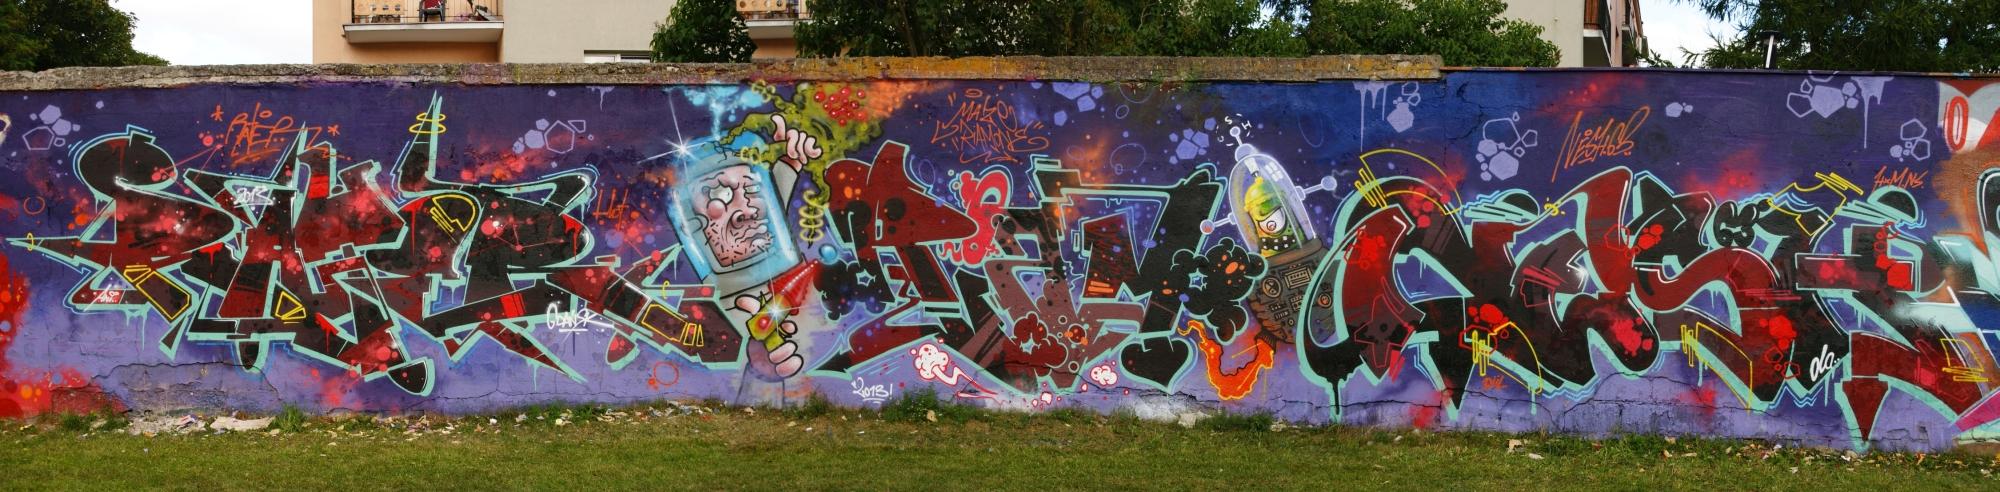 Rater_Nesh_Graffiti_Poland_Spraydaily_2013_1